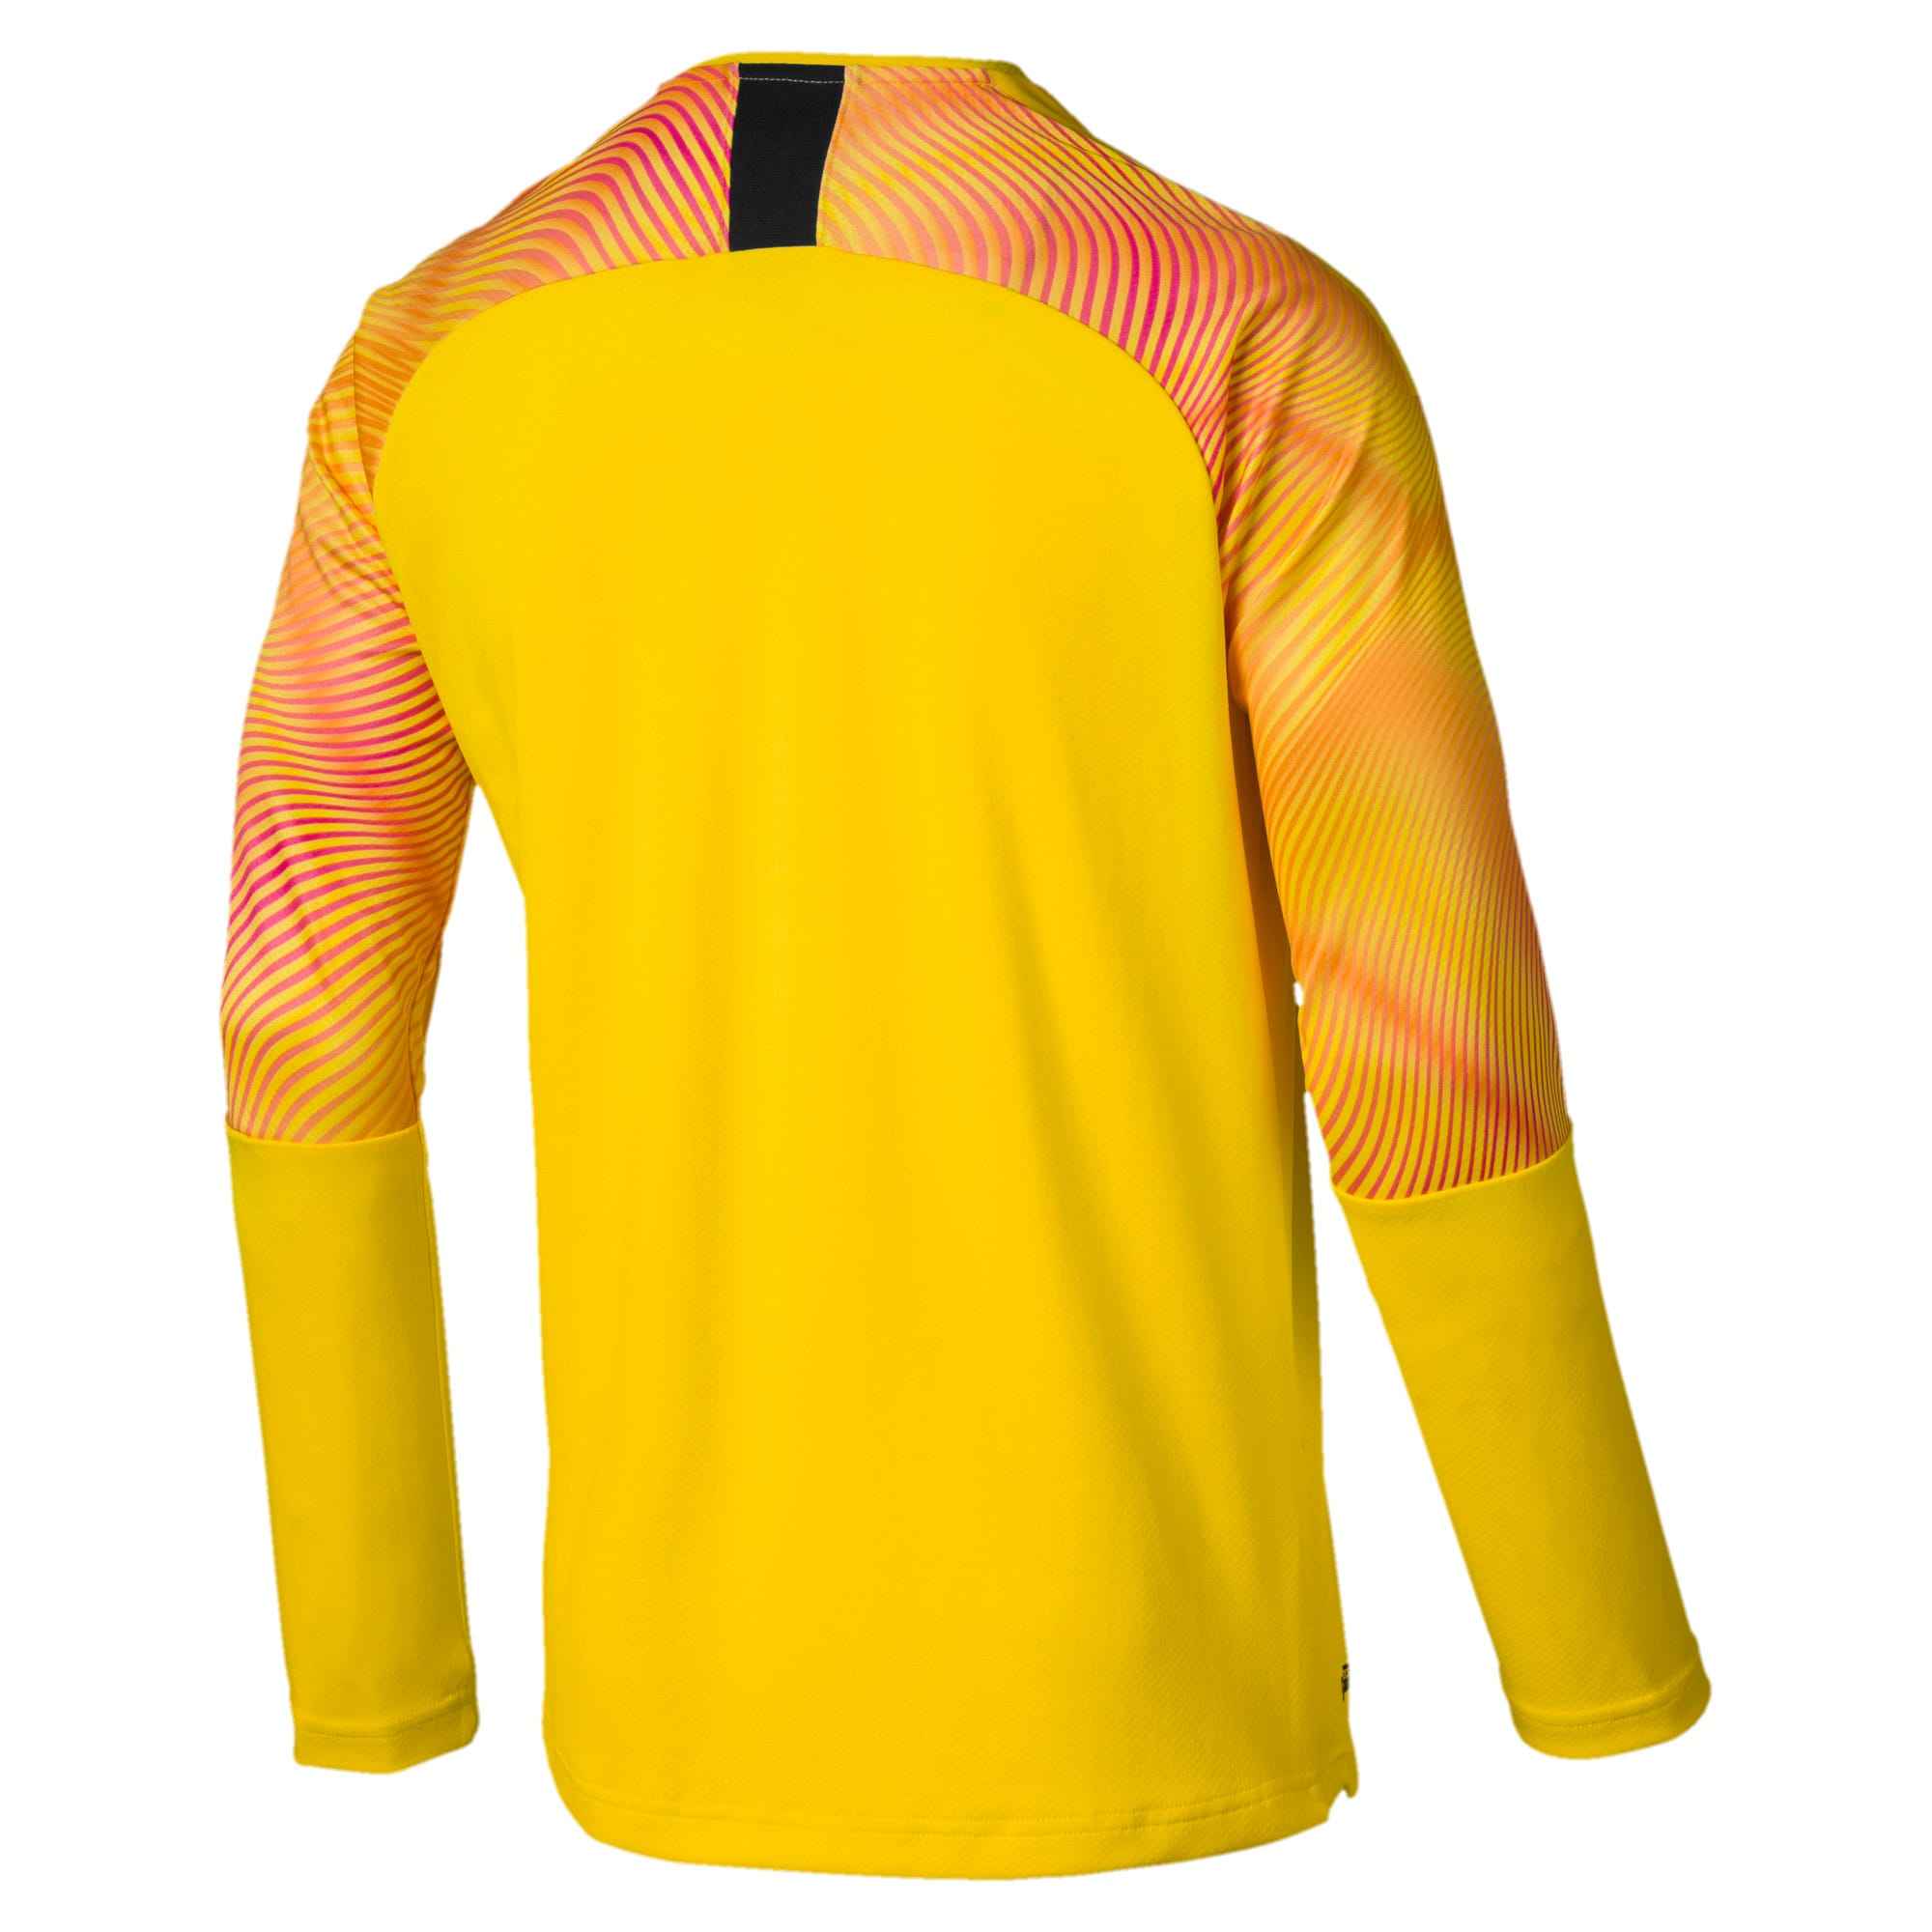 Thumbnail 2 of Maillot de goal Manchester City Replica pour homme, Cyber Yellow-Puma Black, medium